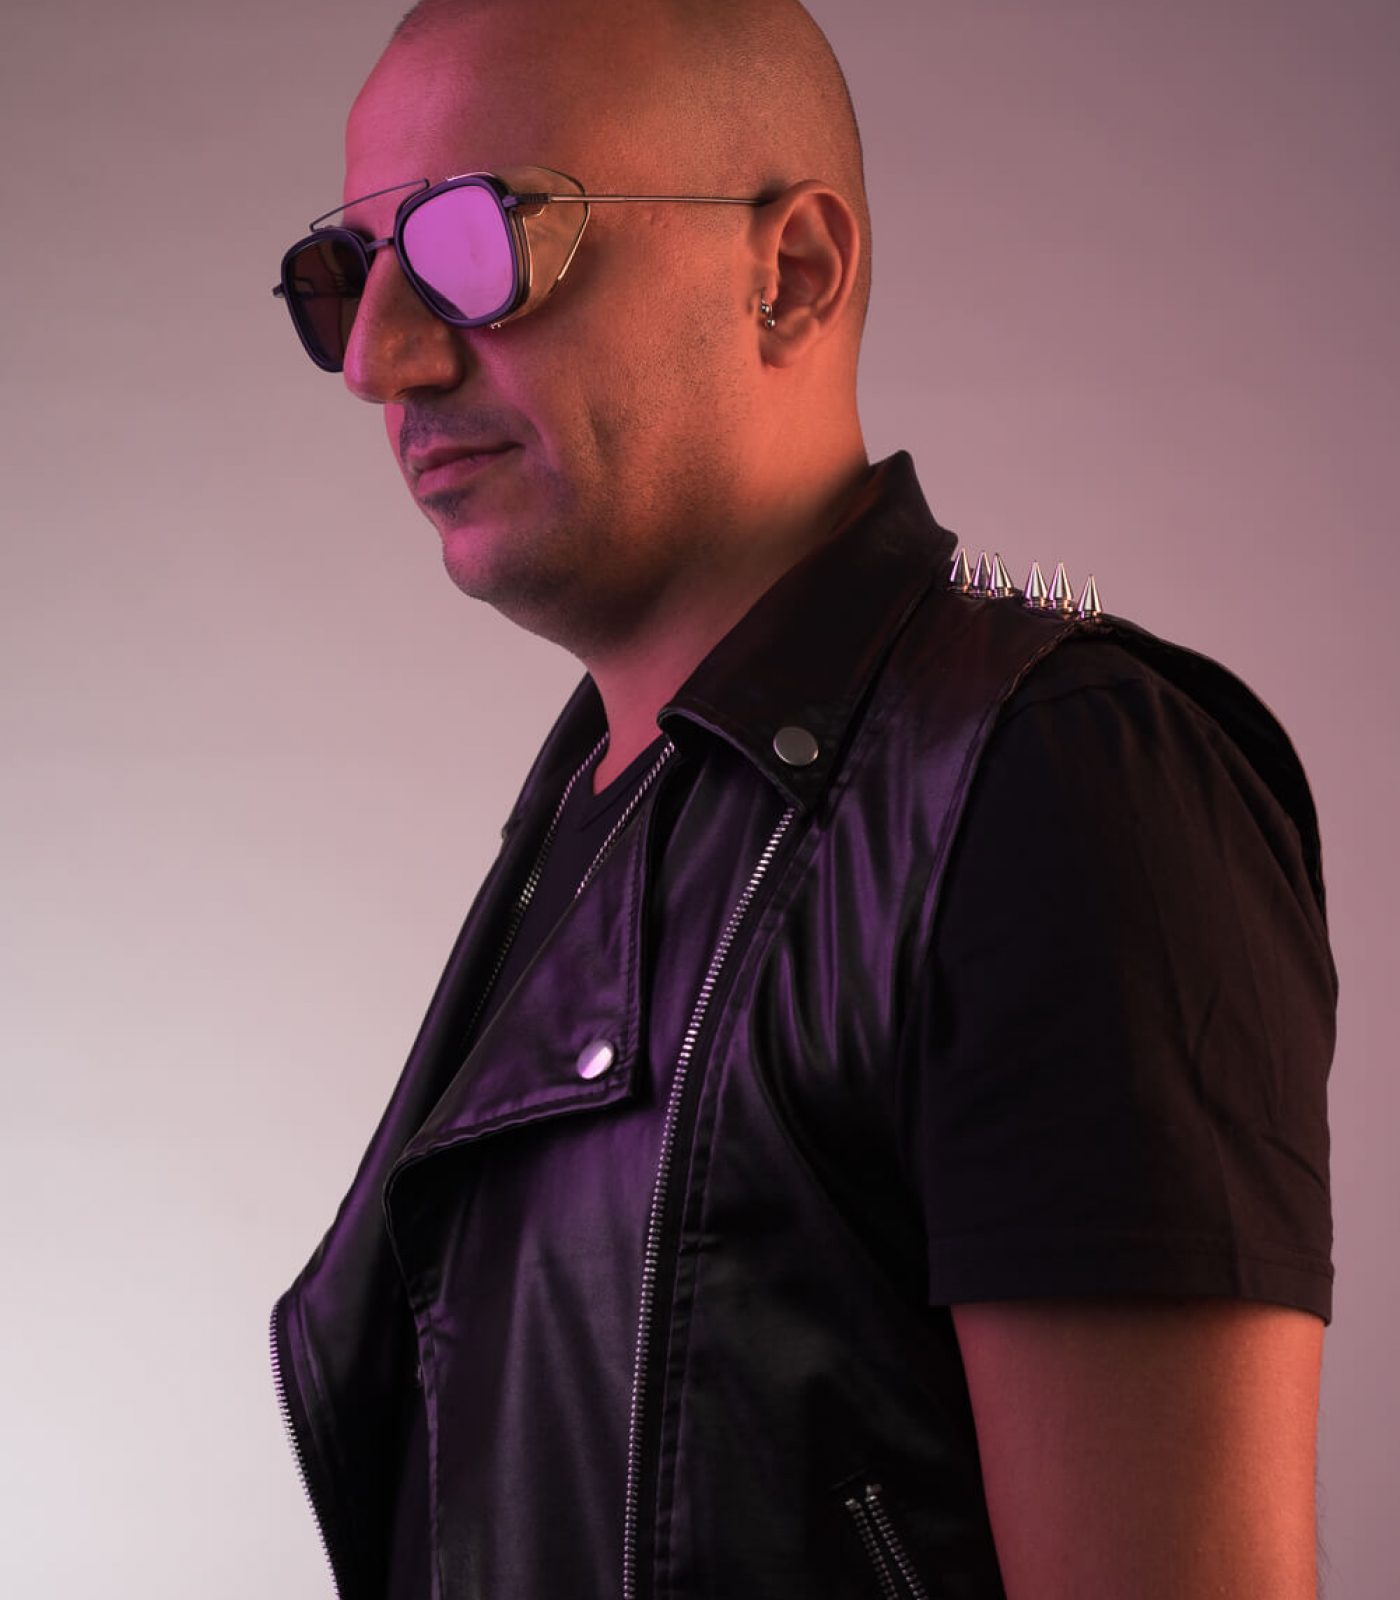 Mr Black - Virgo Music Mgmt